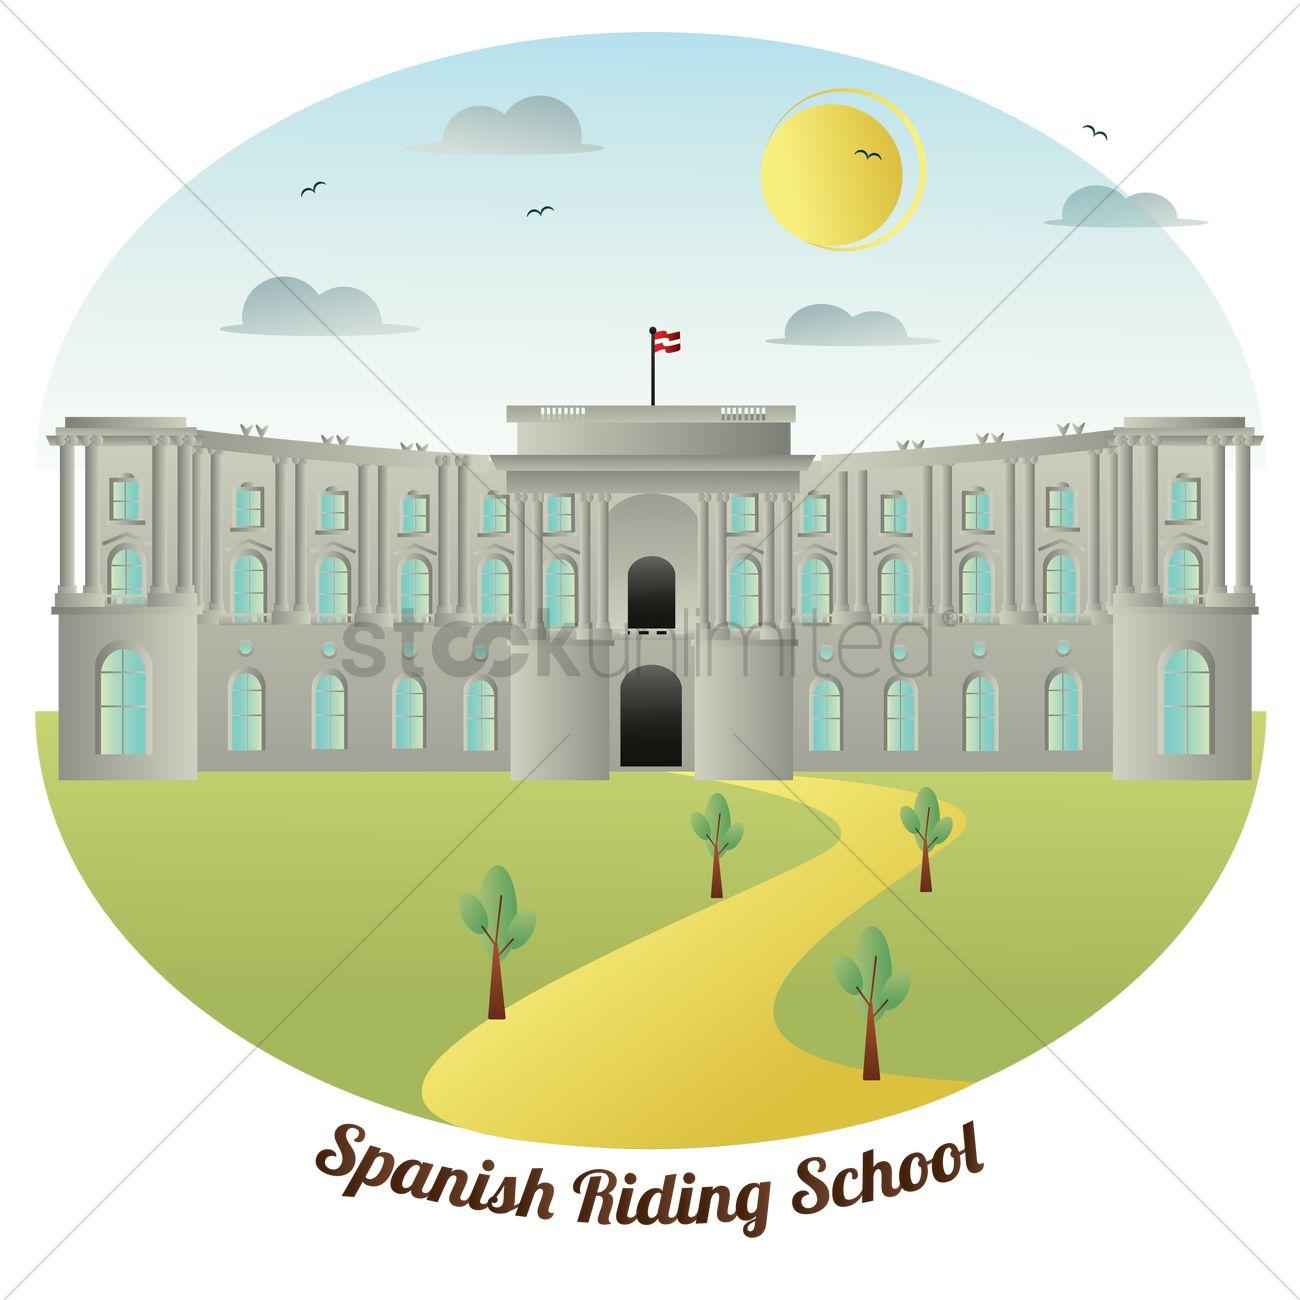 Spanish riding school Vector Image.